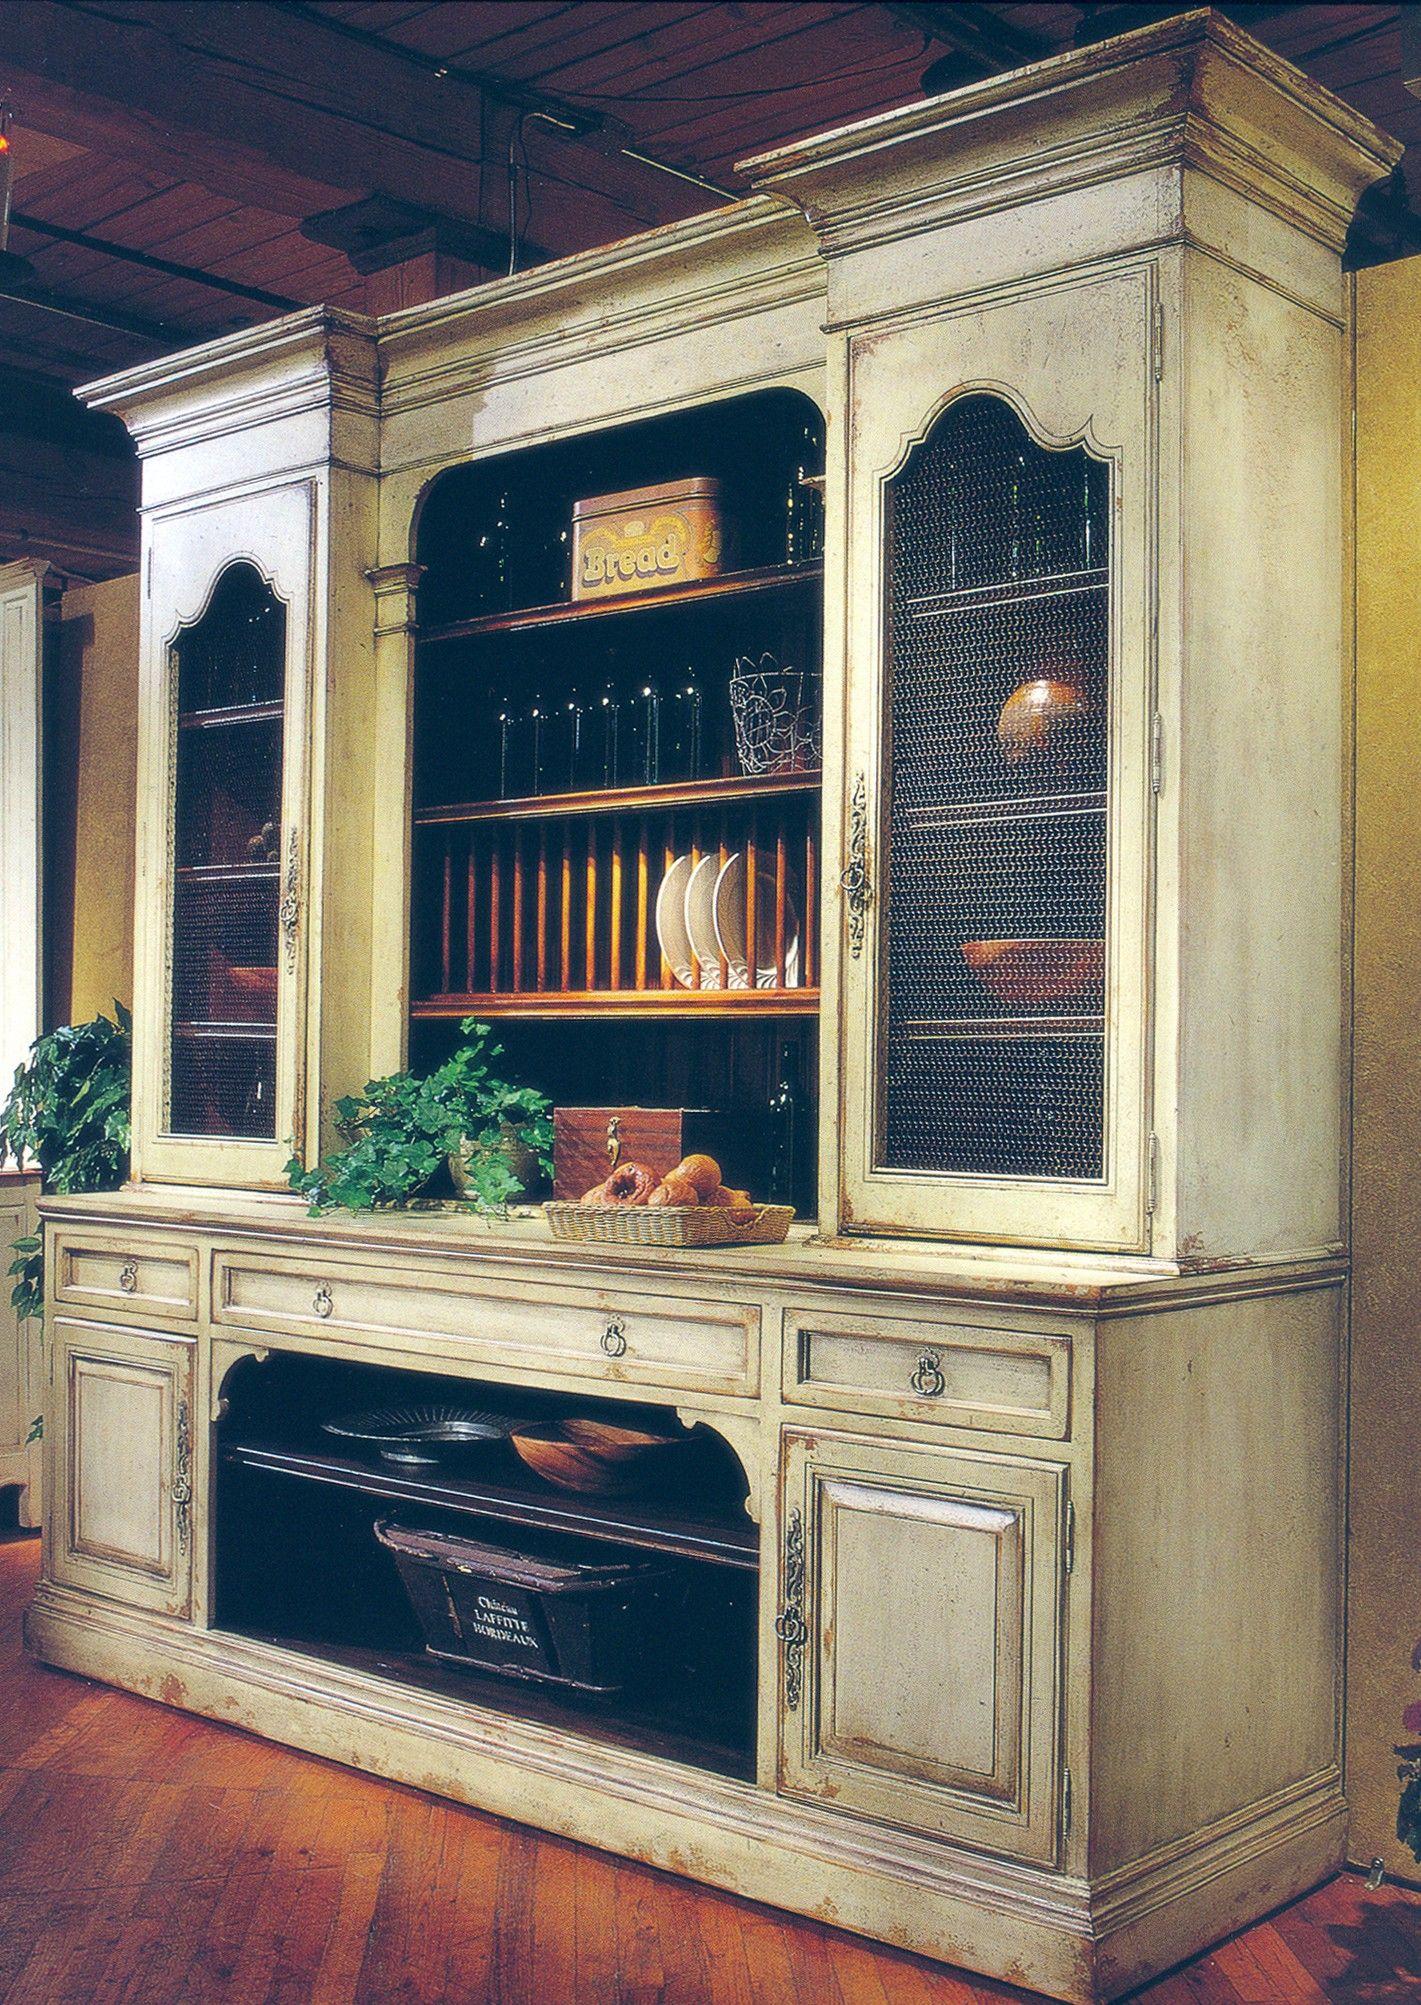 Habersham china display Dining room french